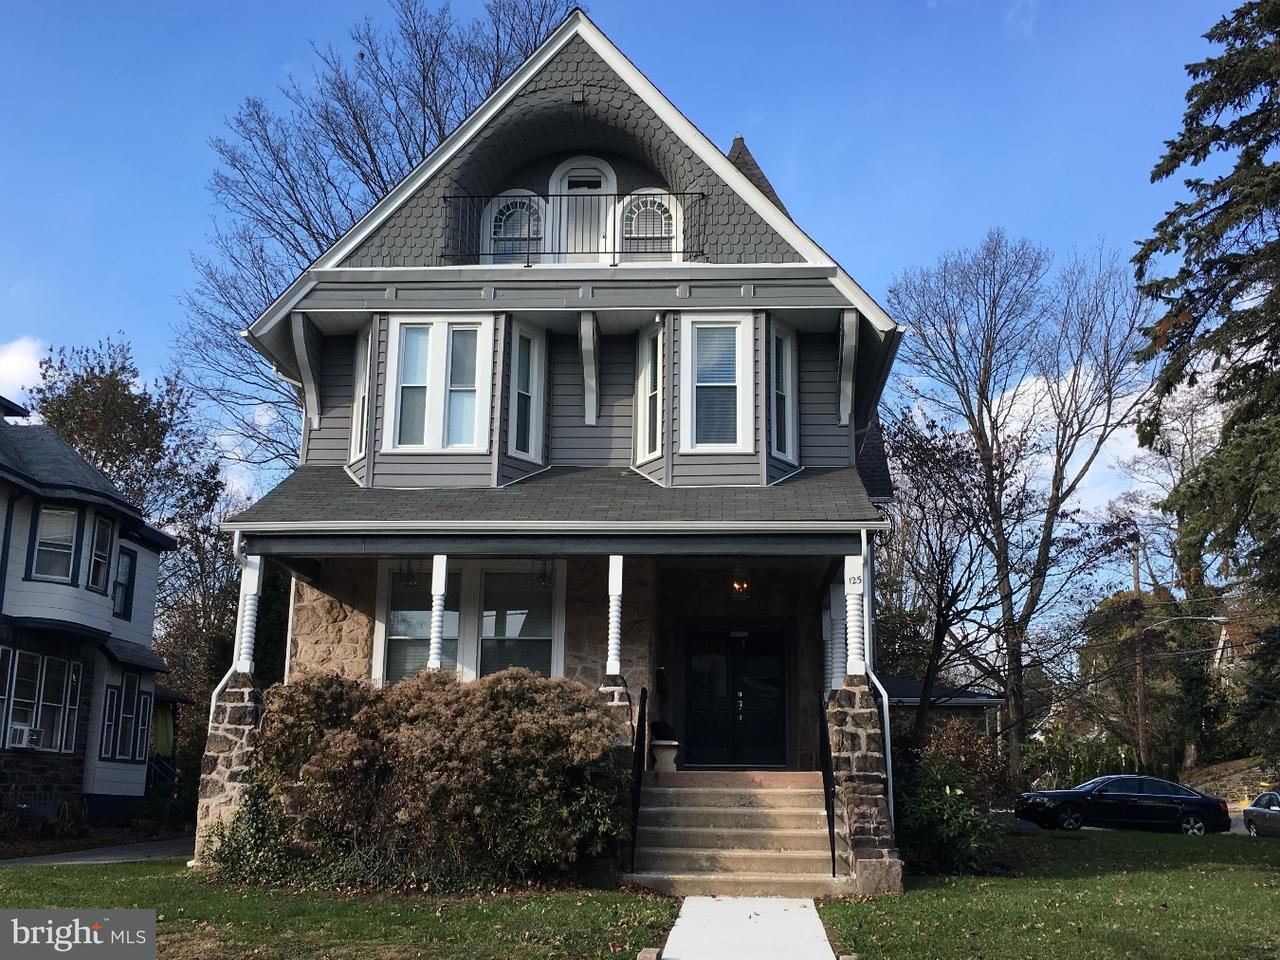 Casa Unifamiliar por un Alquiler en 125 WINDSOR AVE #3RD FL Narberth, Pennsylvania 19072 Estados Unidos